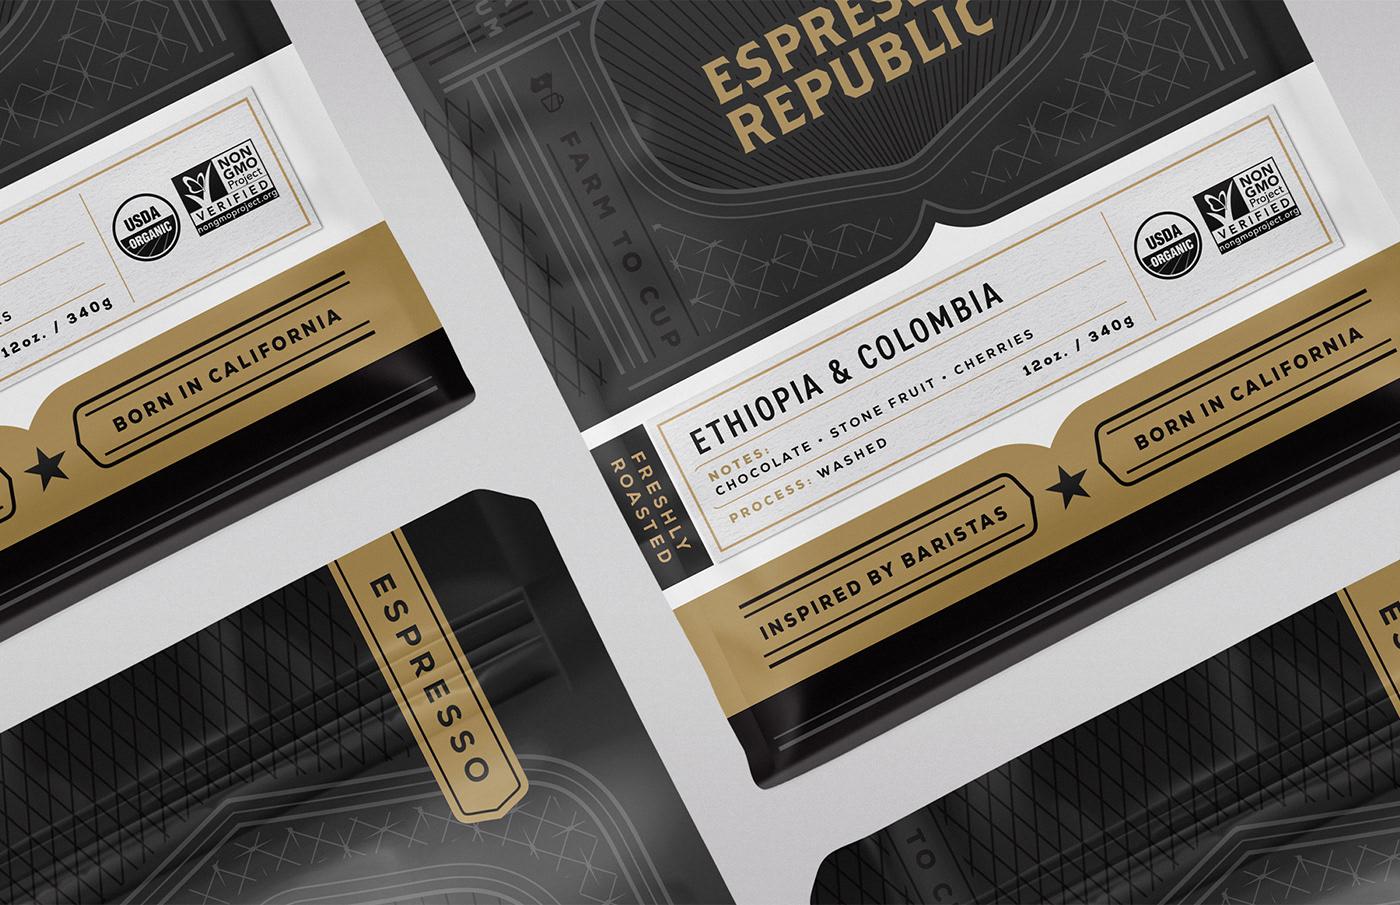 coffee bag packaging design farm design coffee packaging branding  brand identity Coffee print techniques gold foil graphic design